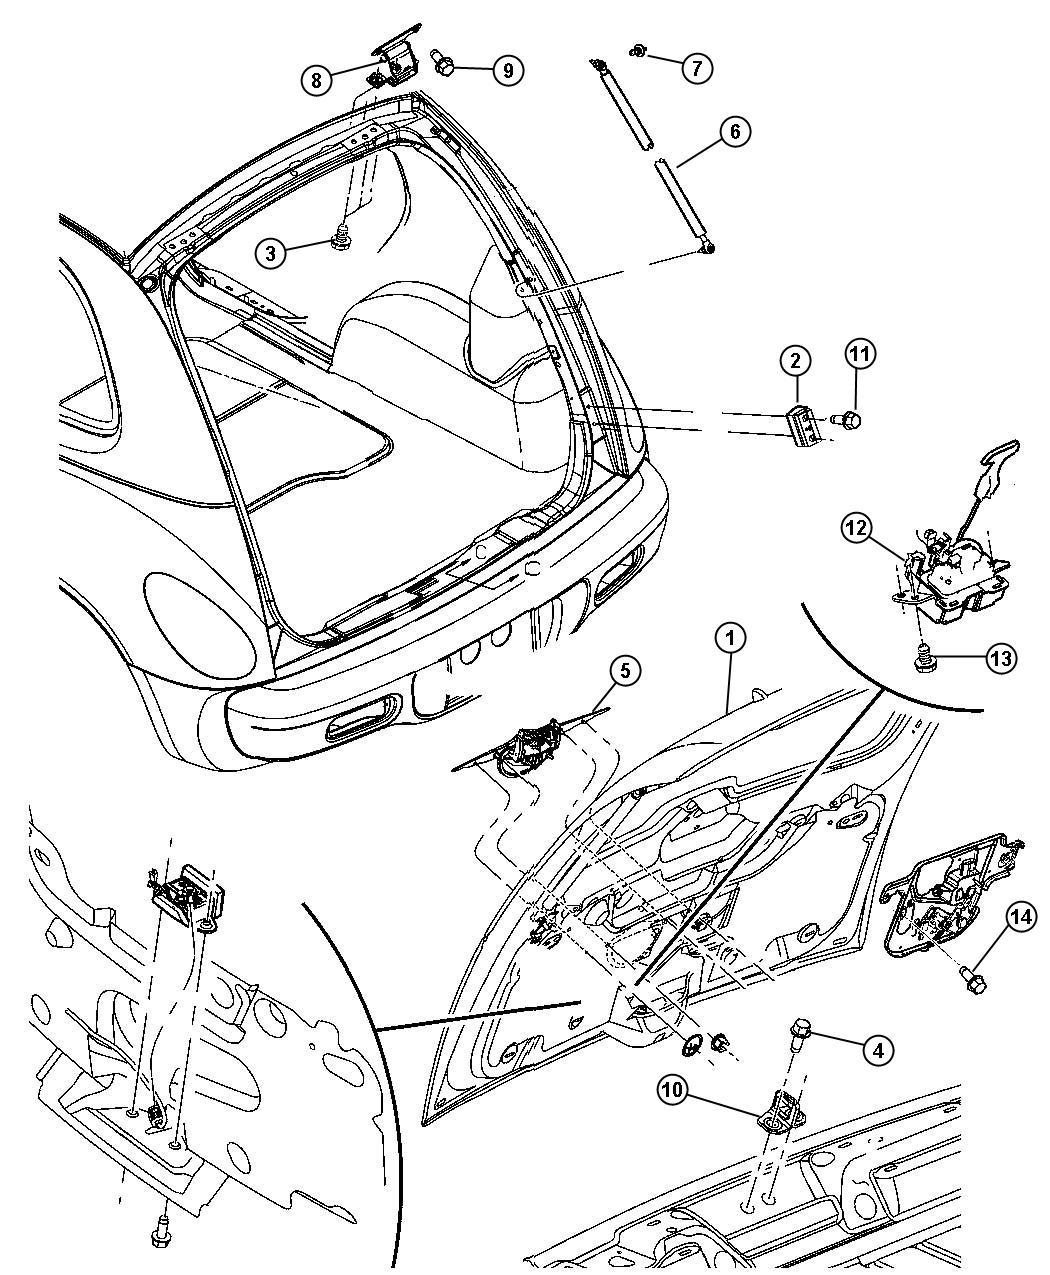 2006 chrysler pt cruiser parts catalog 2006 nissan murano wiring diagram at w freeautoresponder